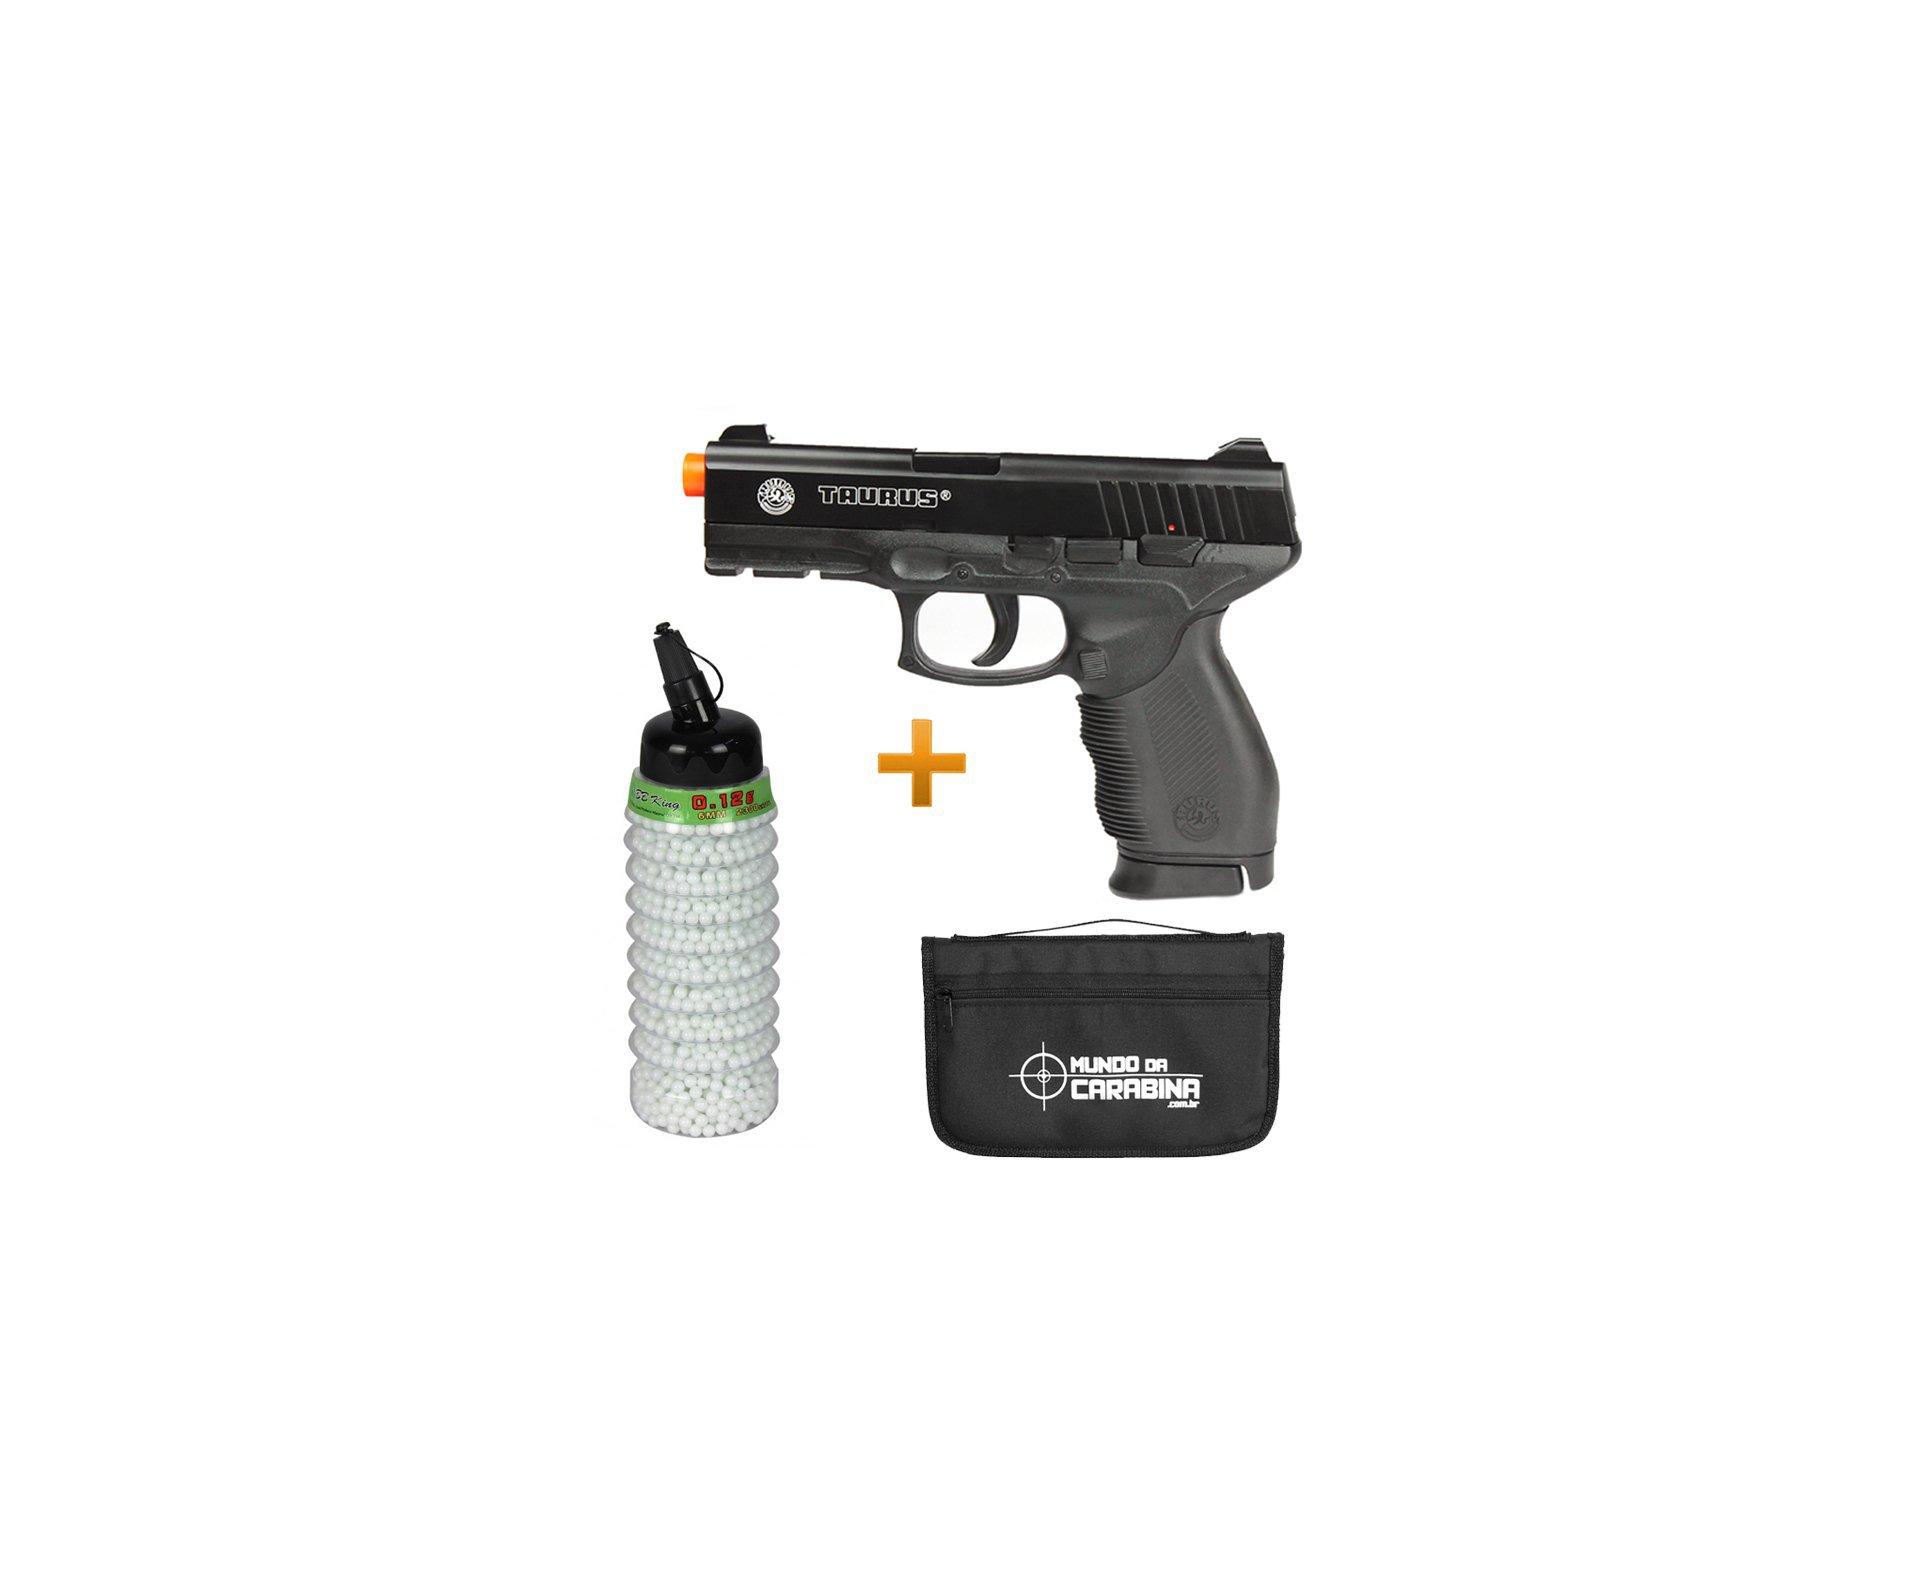 Pistola De Airsoft Taurus Pt 24/7 Semi/metal Cal 6,0 Mm + 4000 Esferas Plásticas 0,12g + Capa - Cybergun